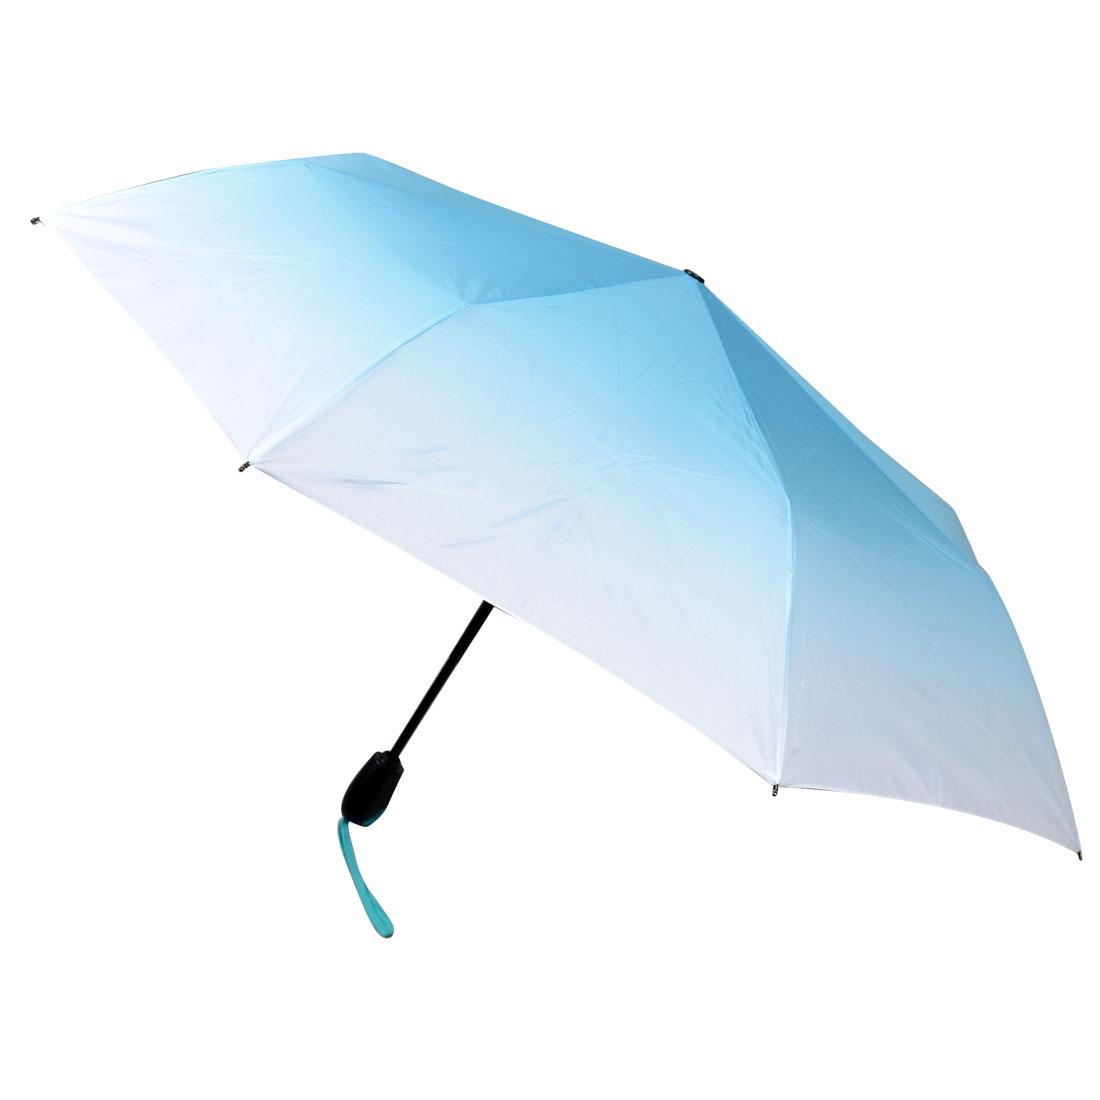 Plastic Grip 3 Sections Retractable Tube Foldable Light Blue Umbrella